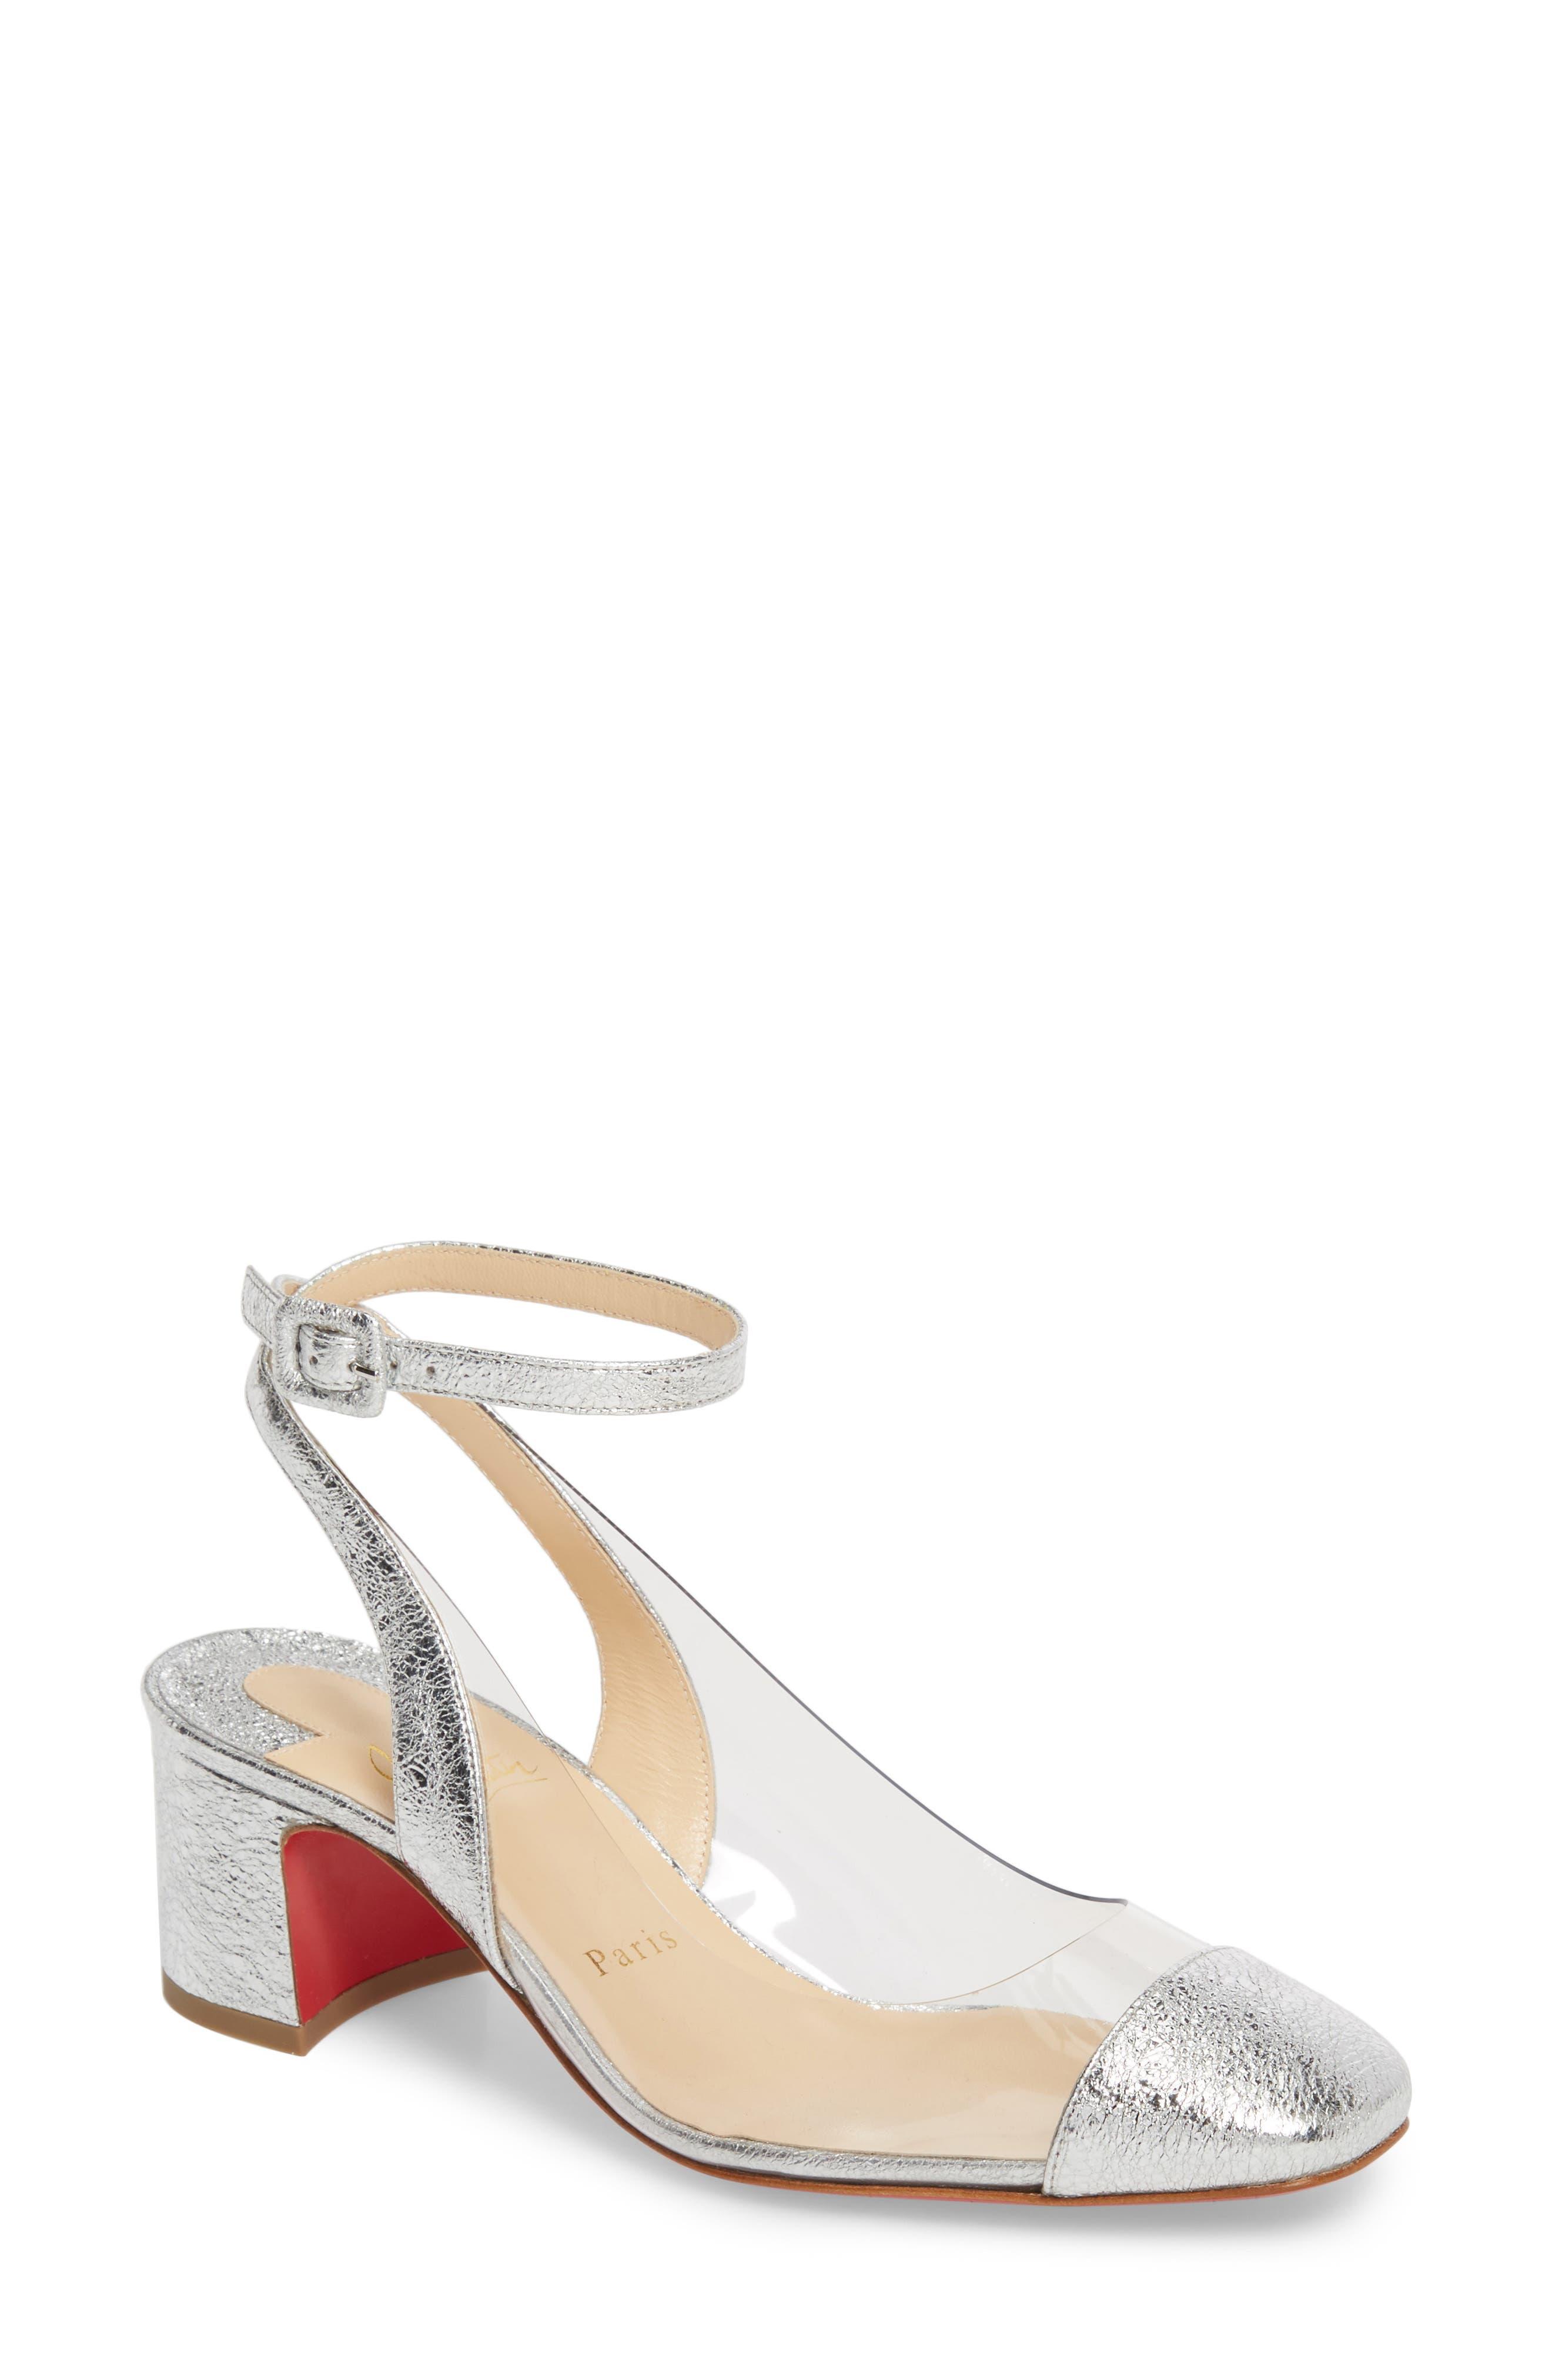 2b29e8cc4a9 Christian Louboutin Women s Block Shoes